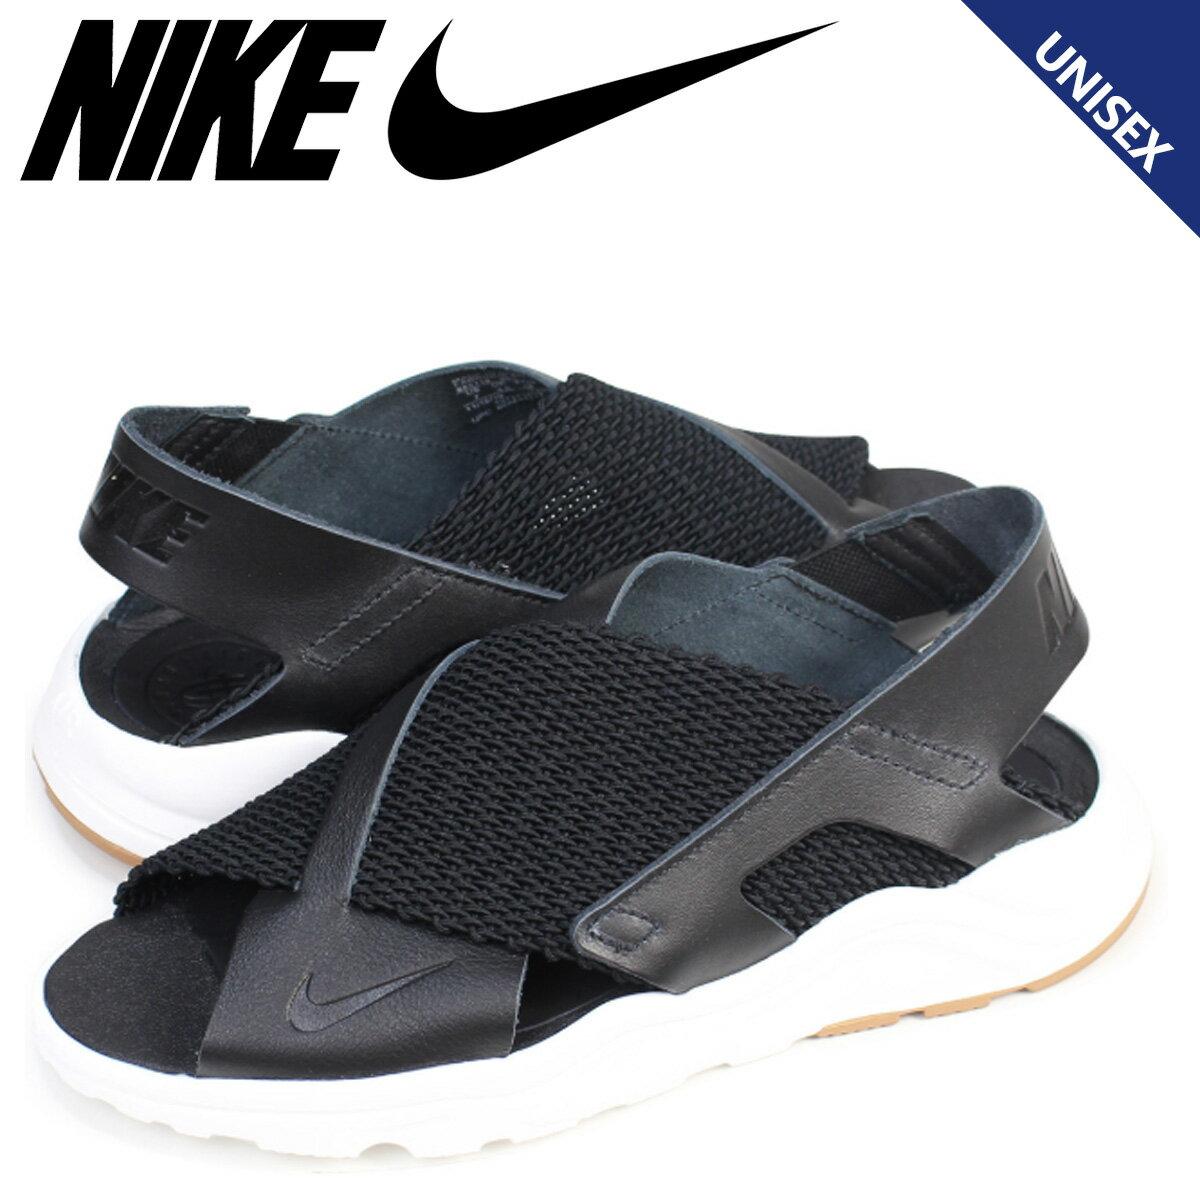 NIKE ナイキ エアハラチ ウルトラ レディース メンズ サンダル W AIR HUARACHE ULTRA 885118-001 靴 ブラック